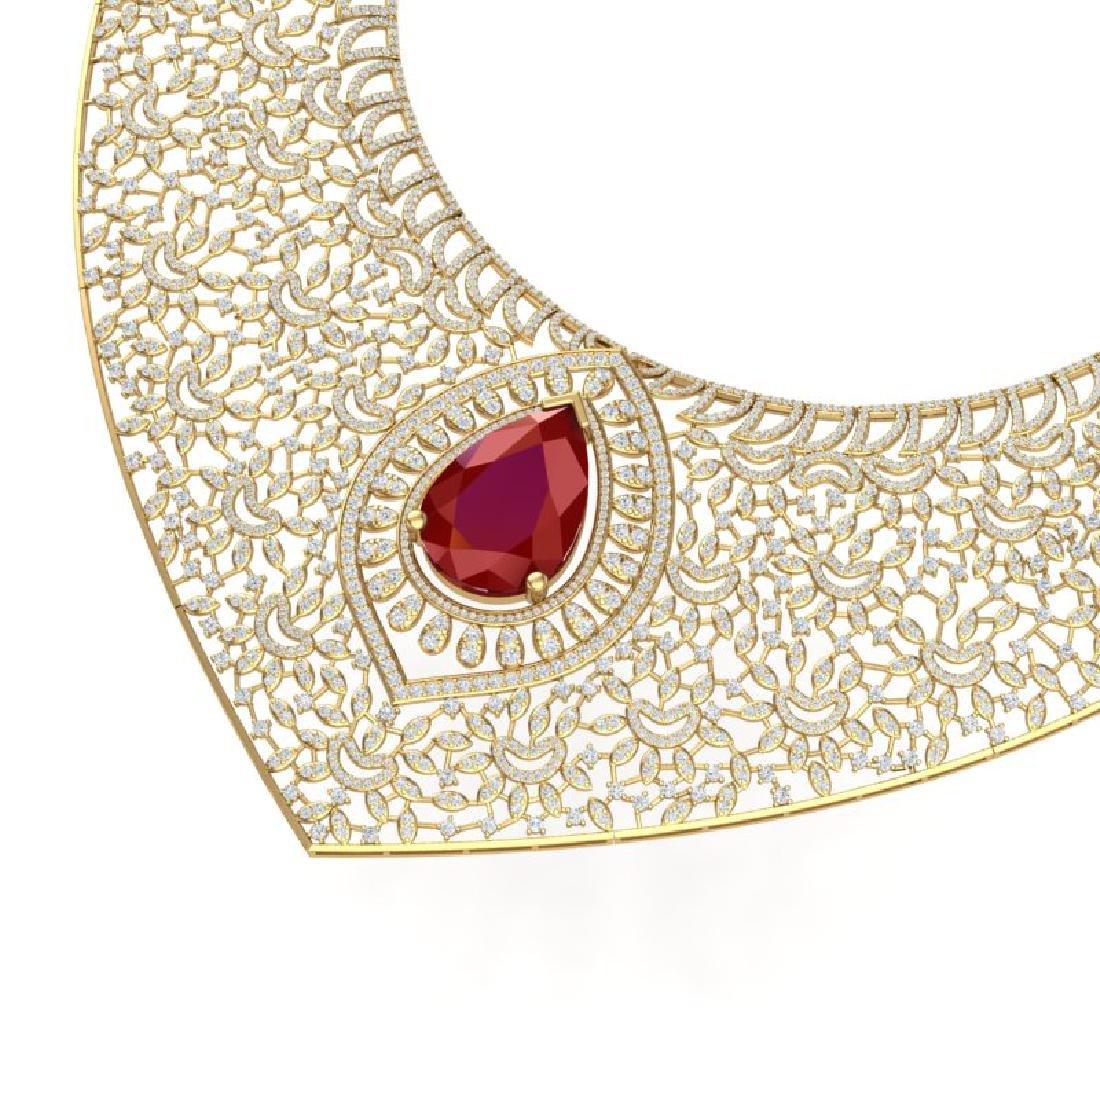 63.93 CTW Royalty Ruby & VS Diamond Necklace 18K Yellow